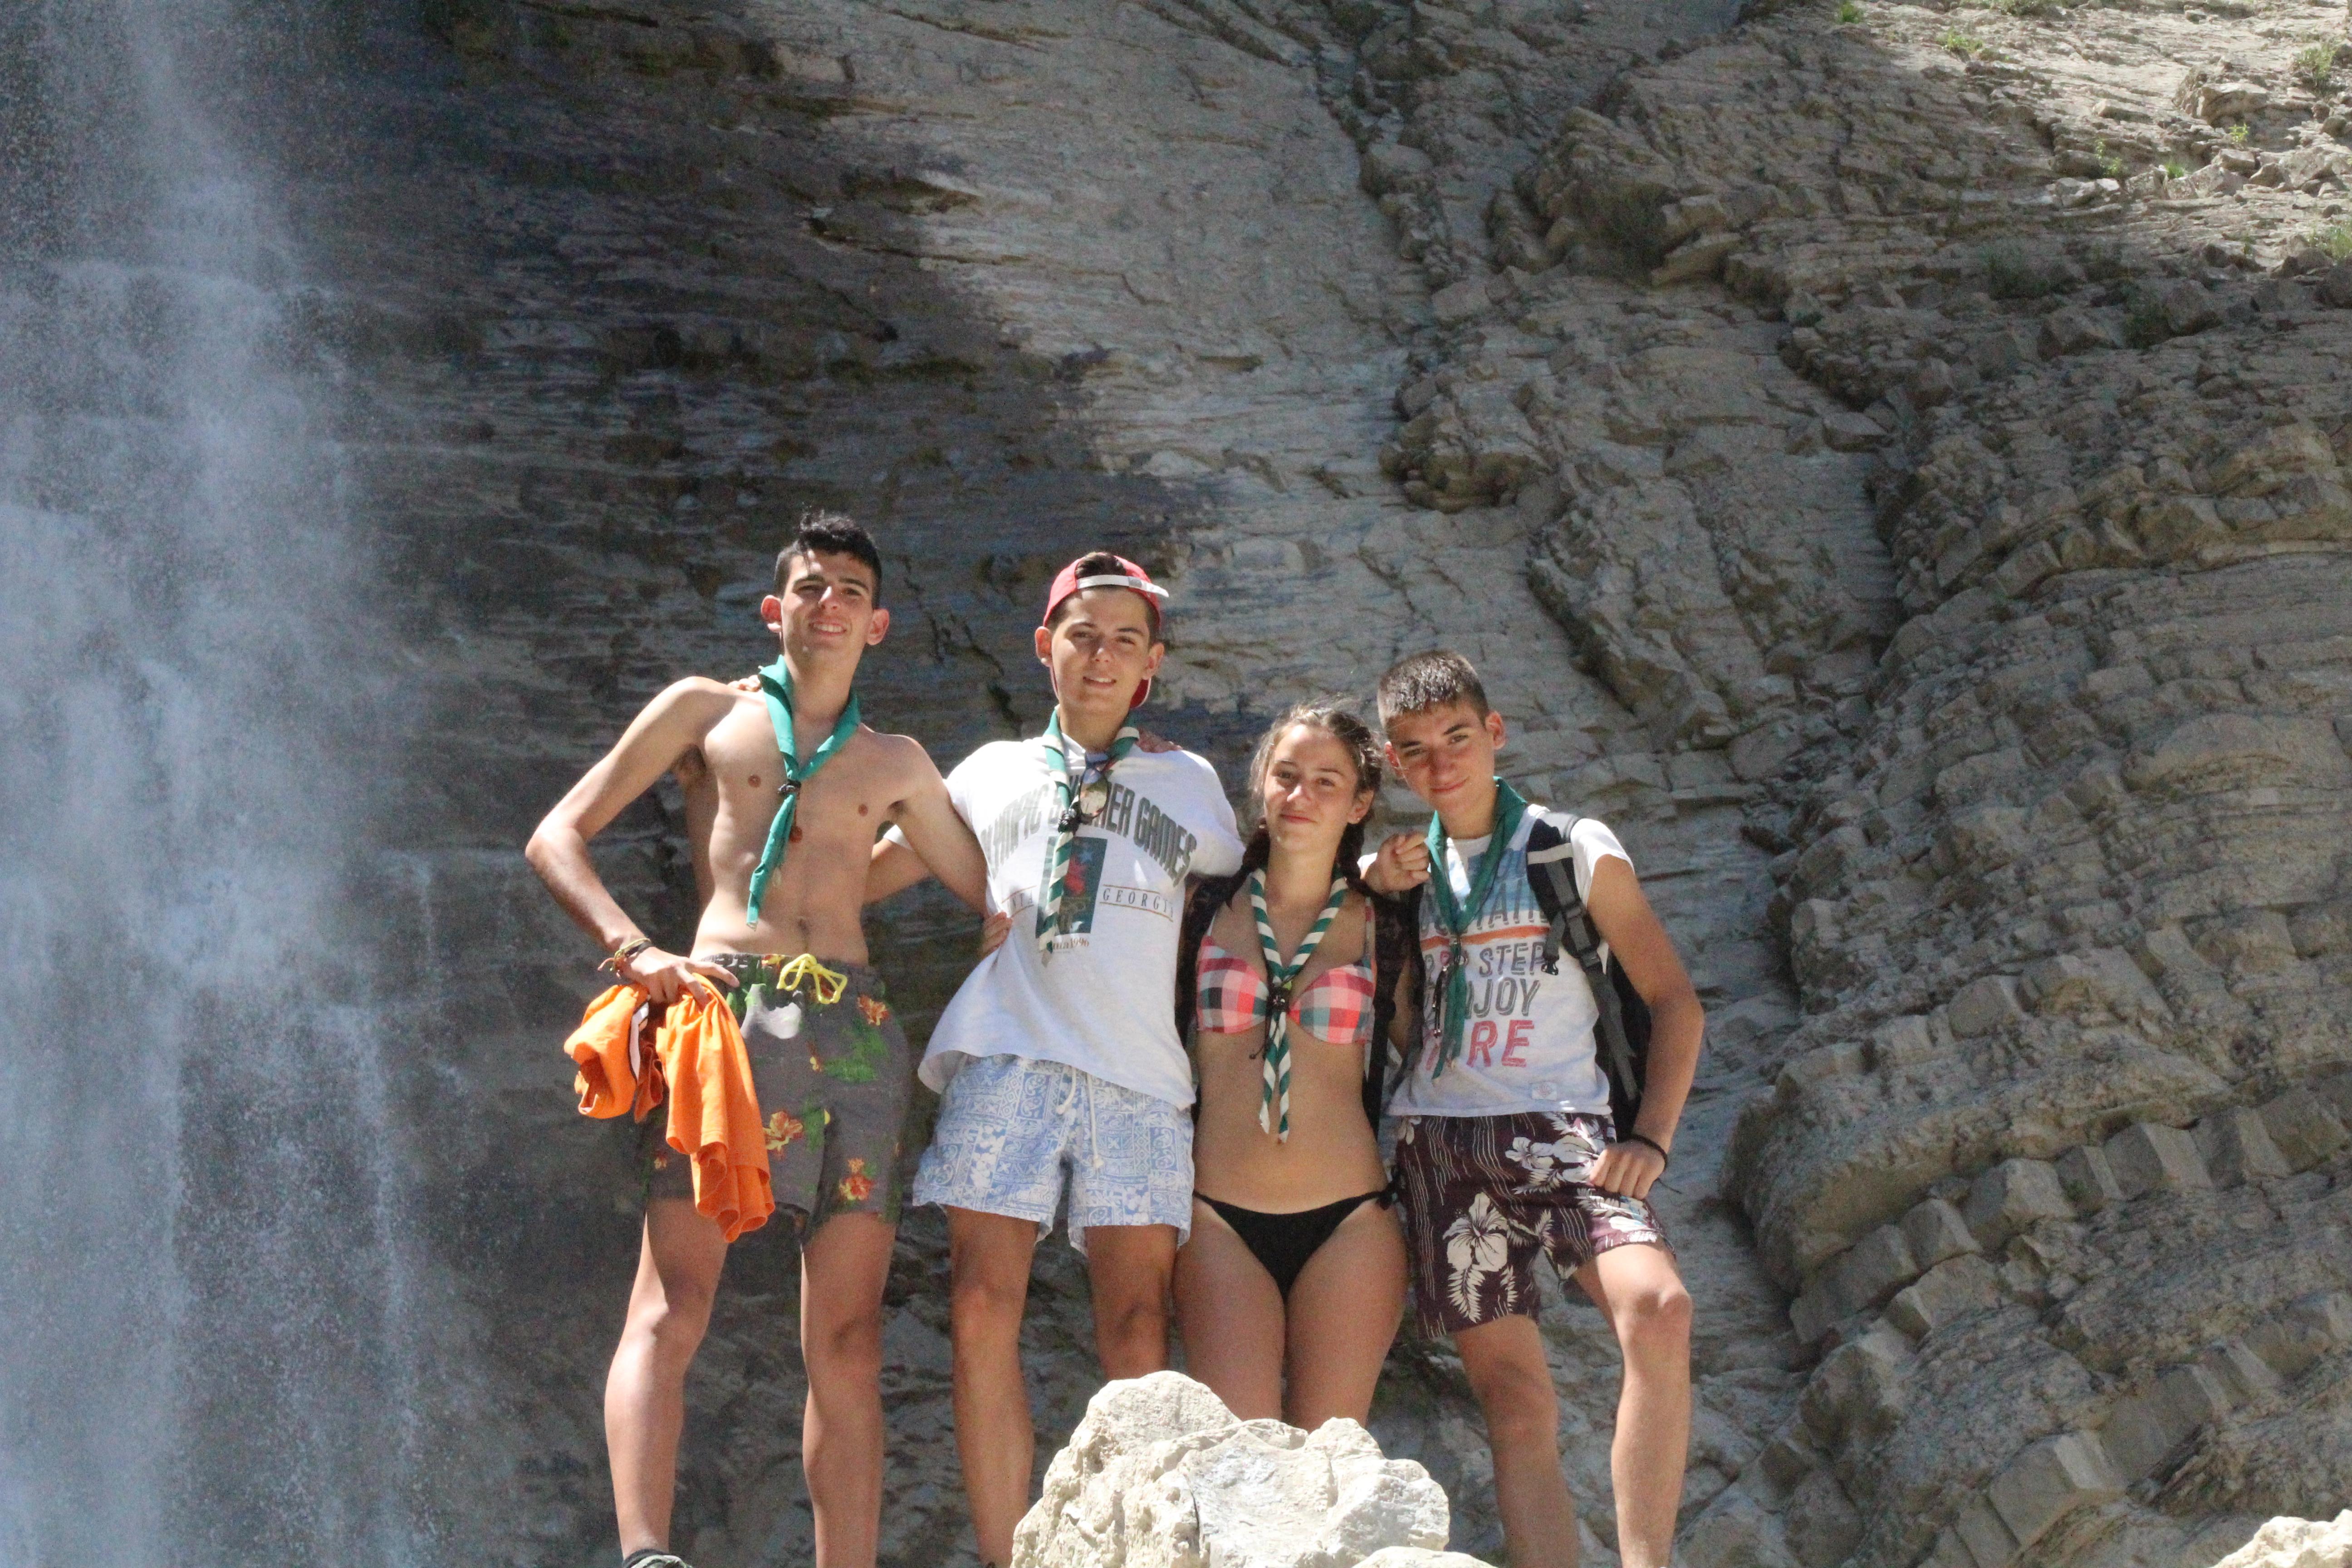 15-16 - Grupo - Campamento de verano - P121